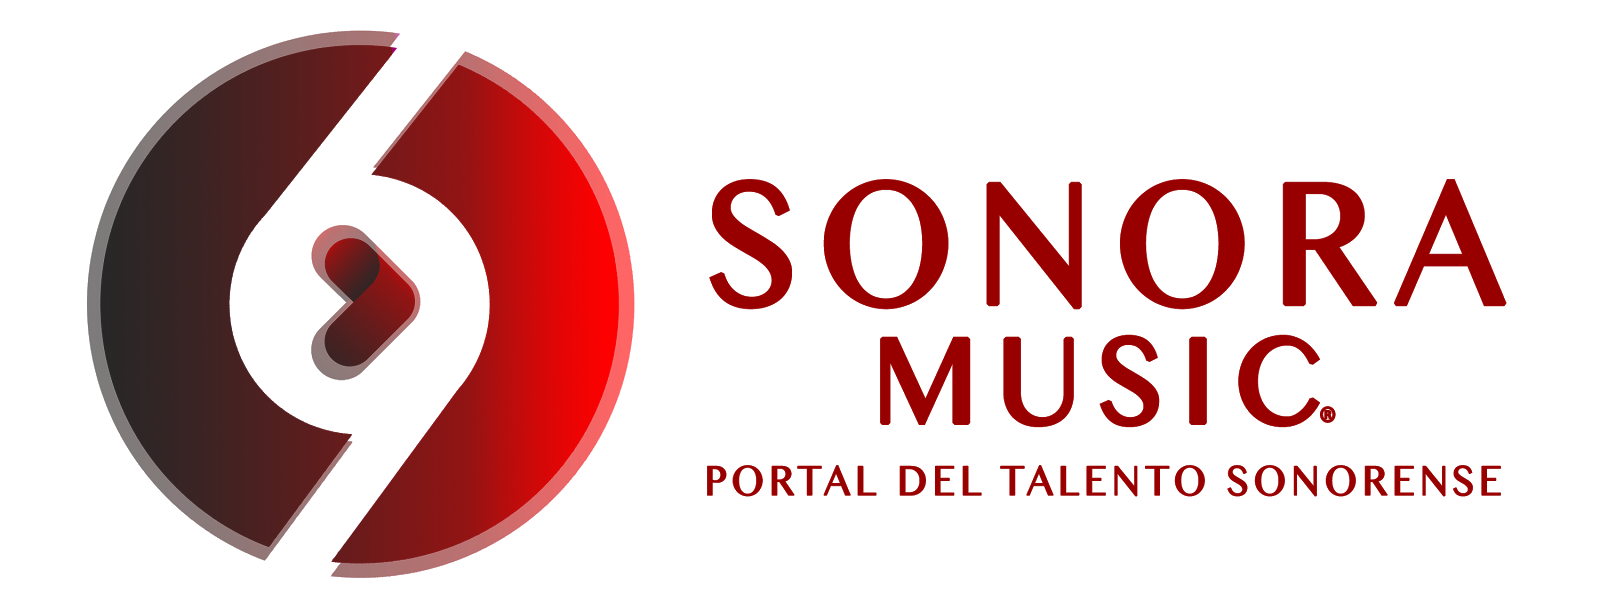 Sonora Music Mx